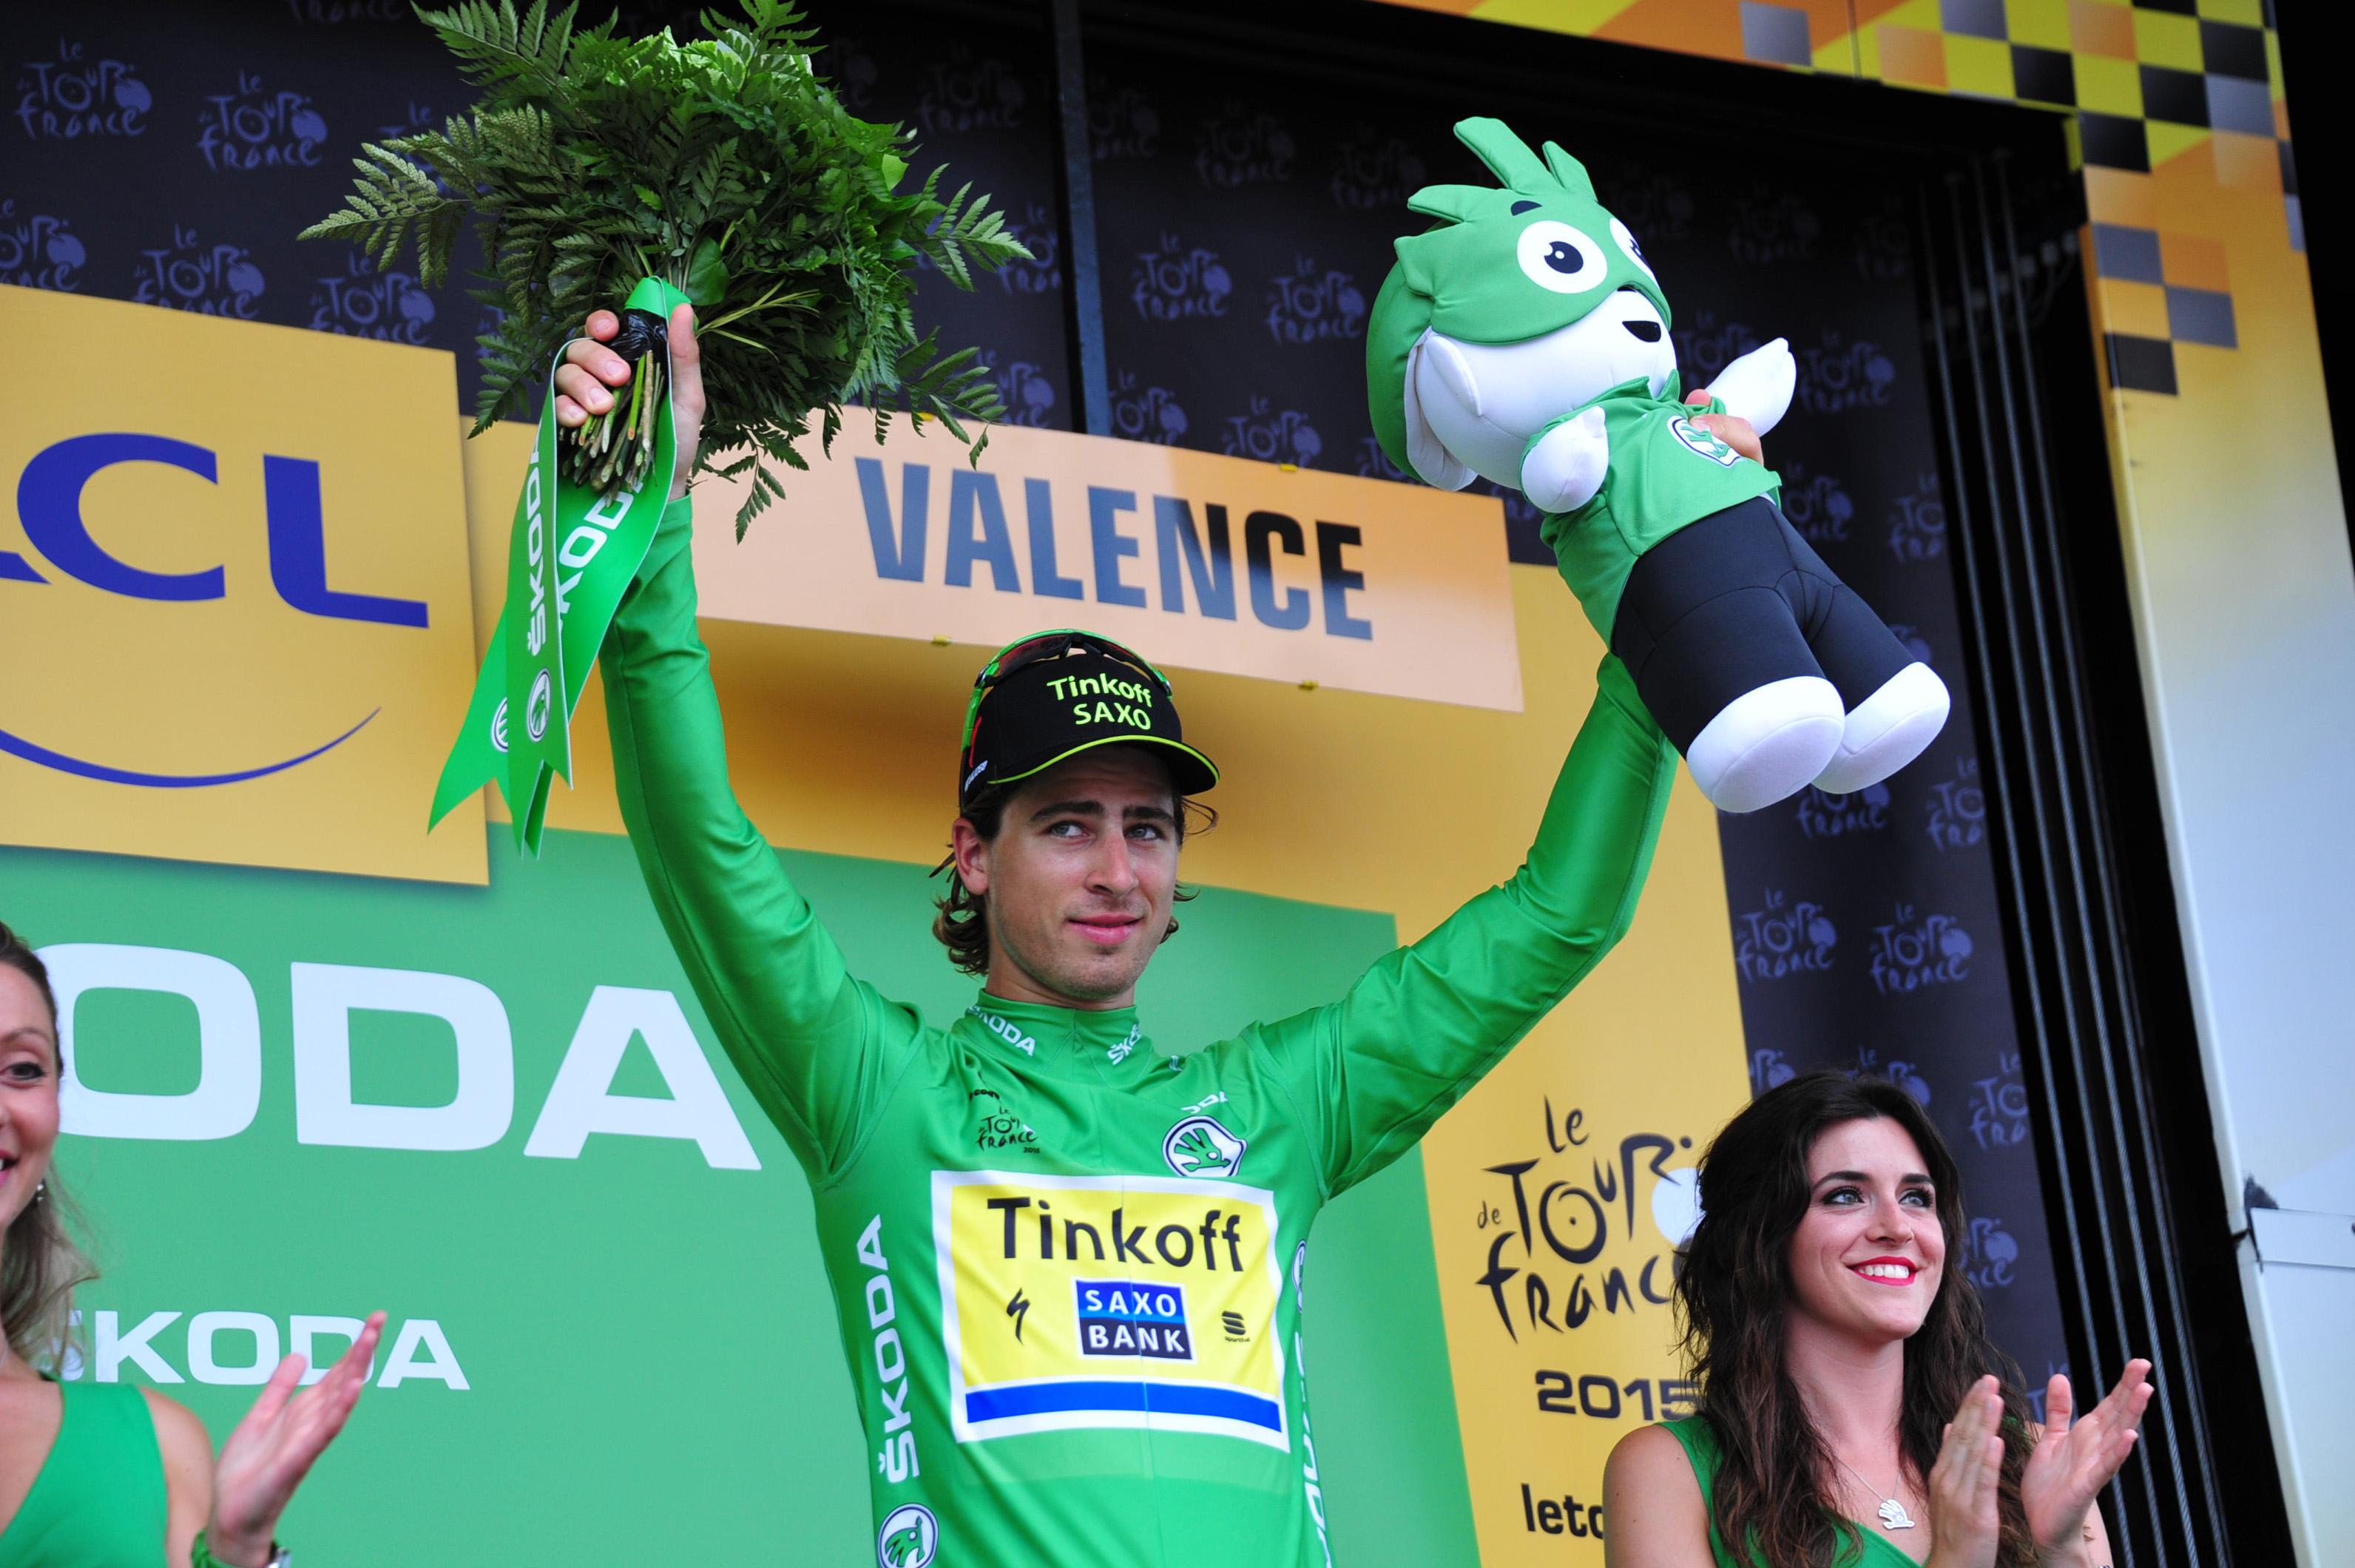 Peter Sagan konnte trotz Punkteverlust auf Greipel das Grüne Trikot halten. (pic: Sirotti)